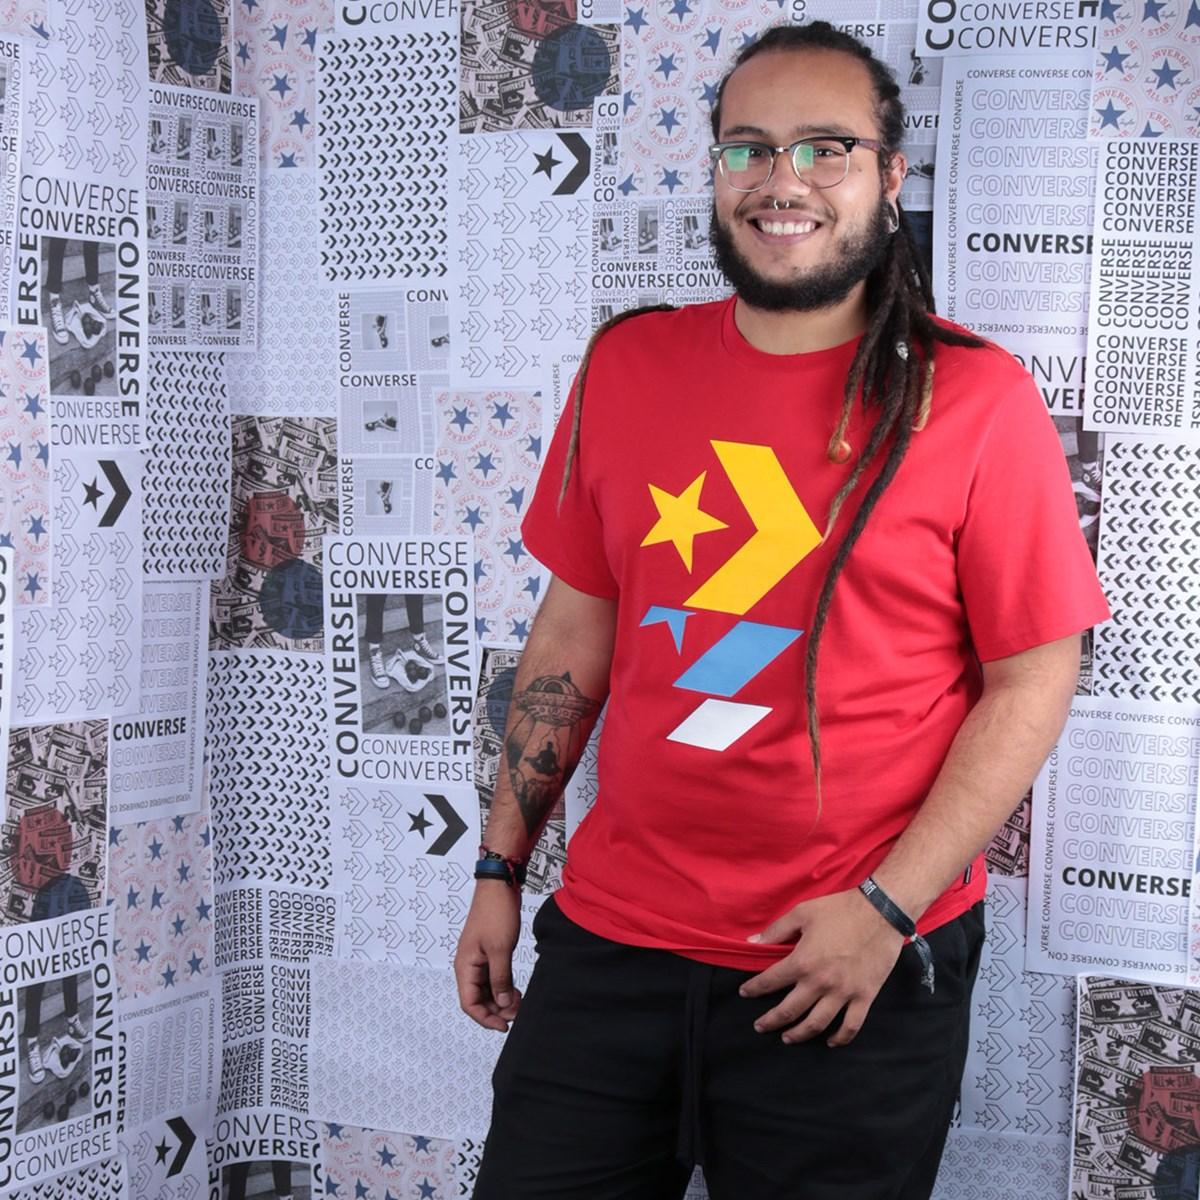 Camiseta Converse Repeated Star Chevron Tee University Red 10017452-A14